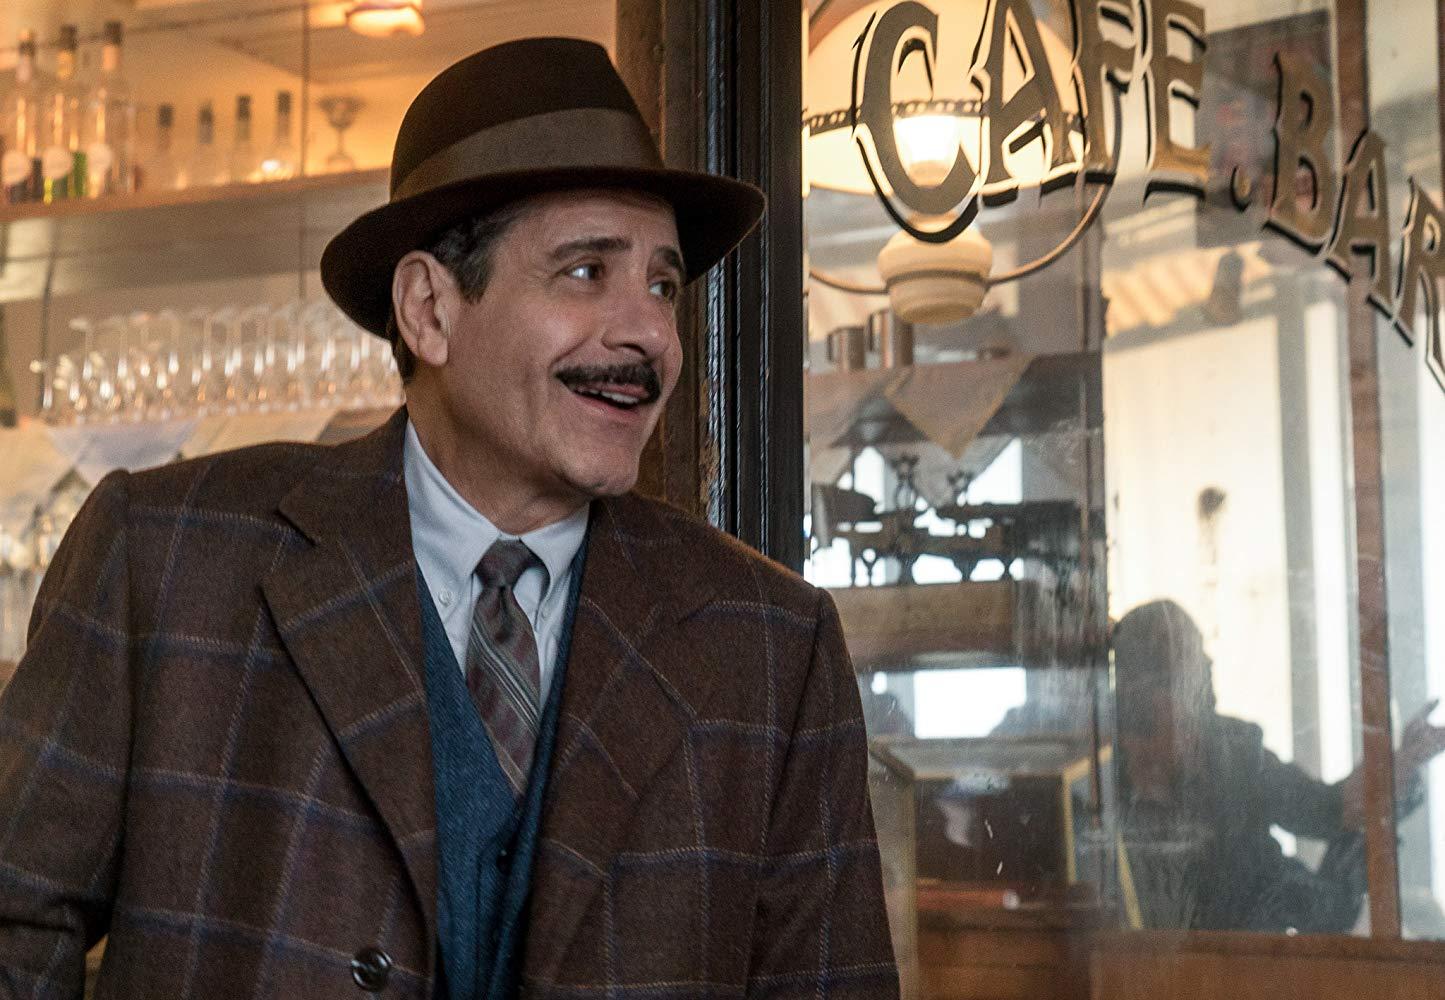 Tony Shalhoub as Abe